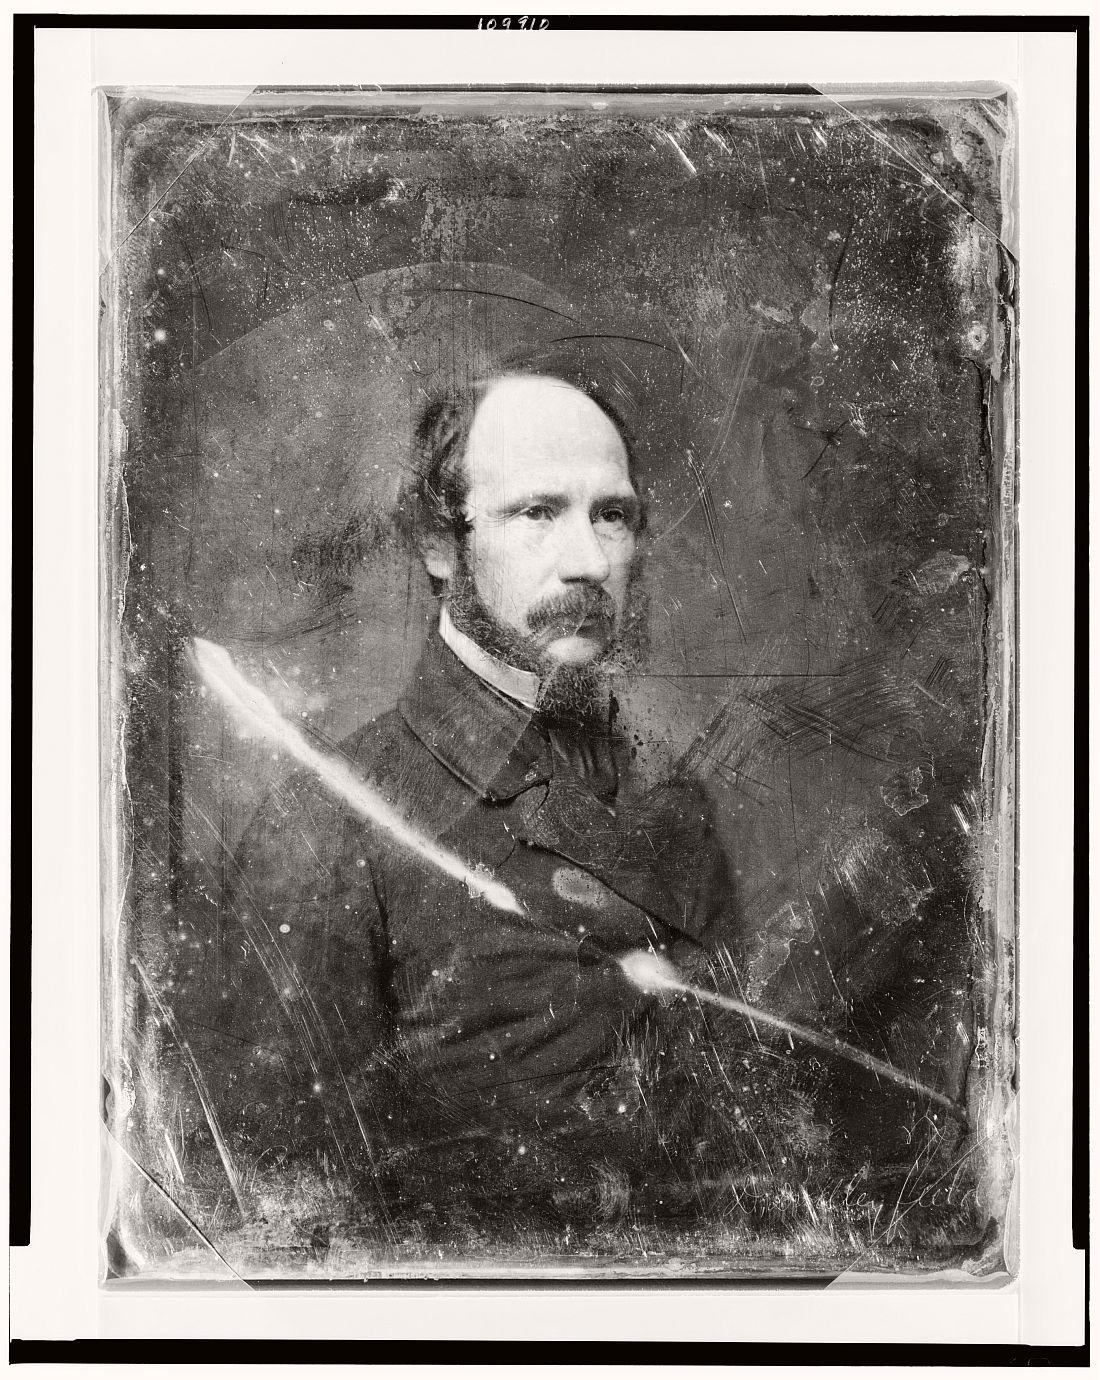 vintage-daguerreotype-portraits-from-xix-century-1844-1860-19